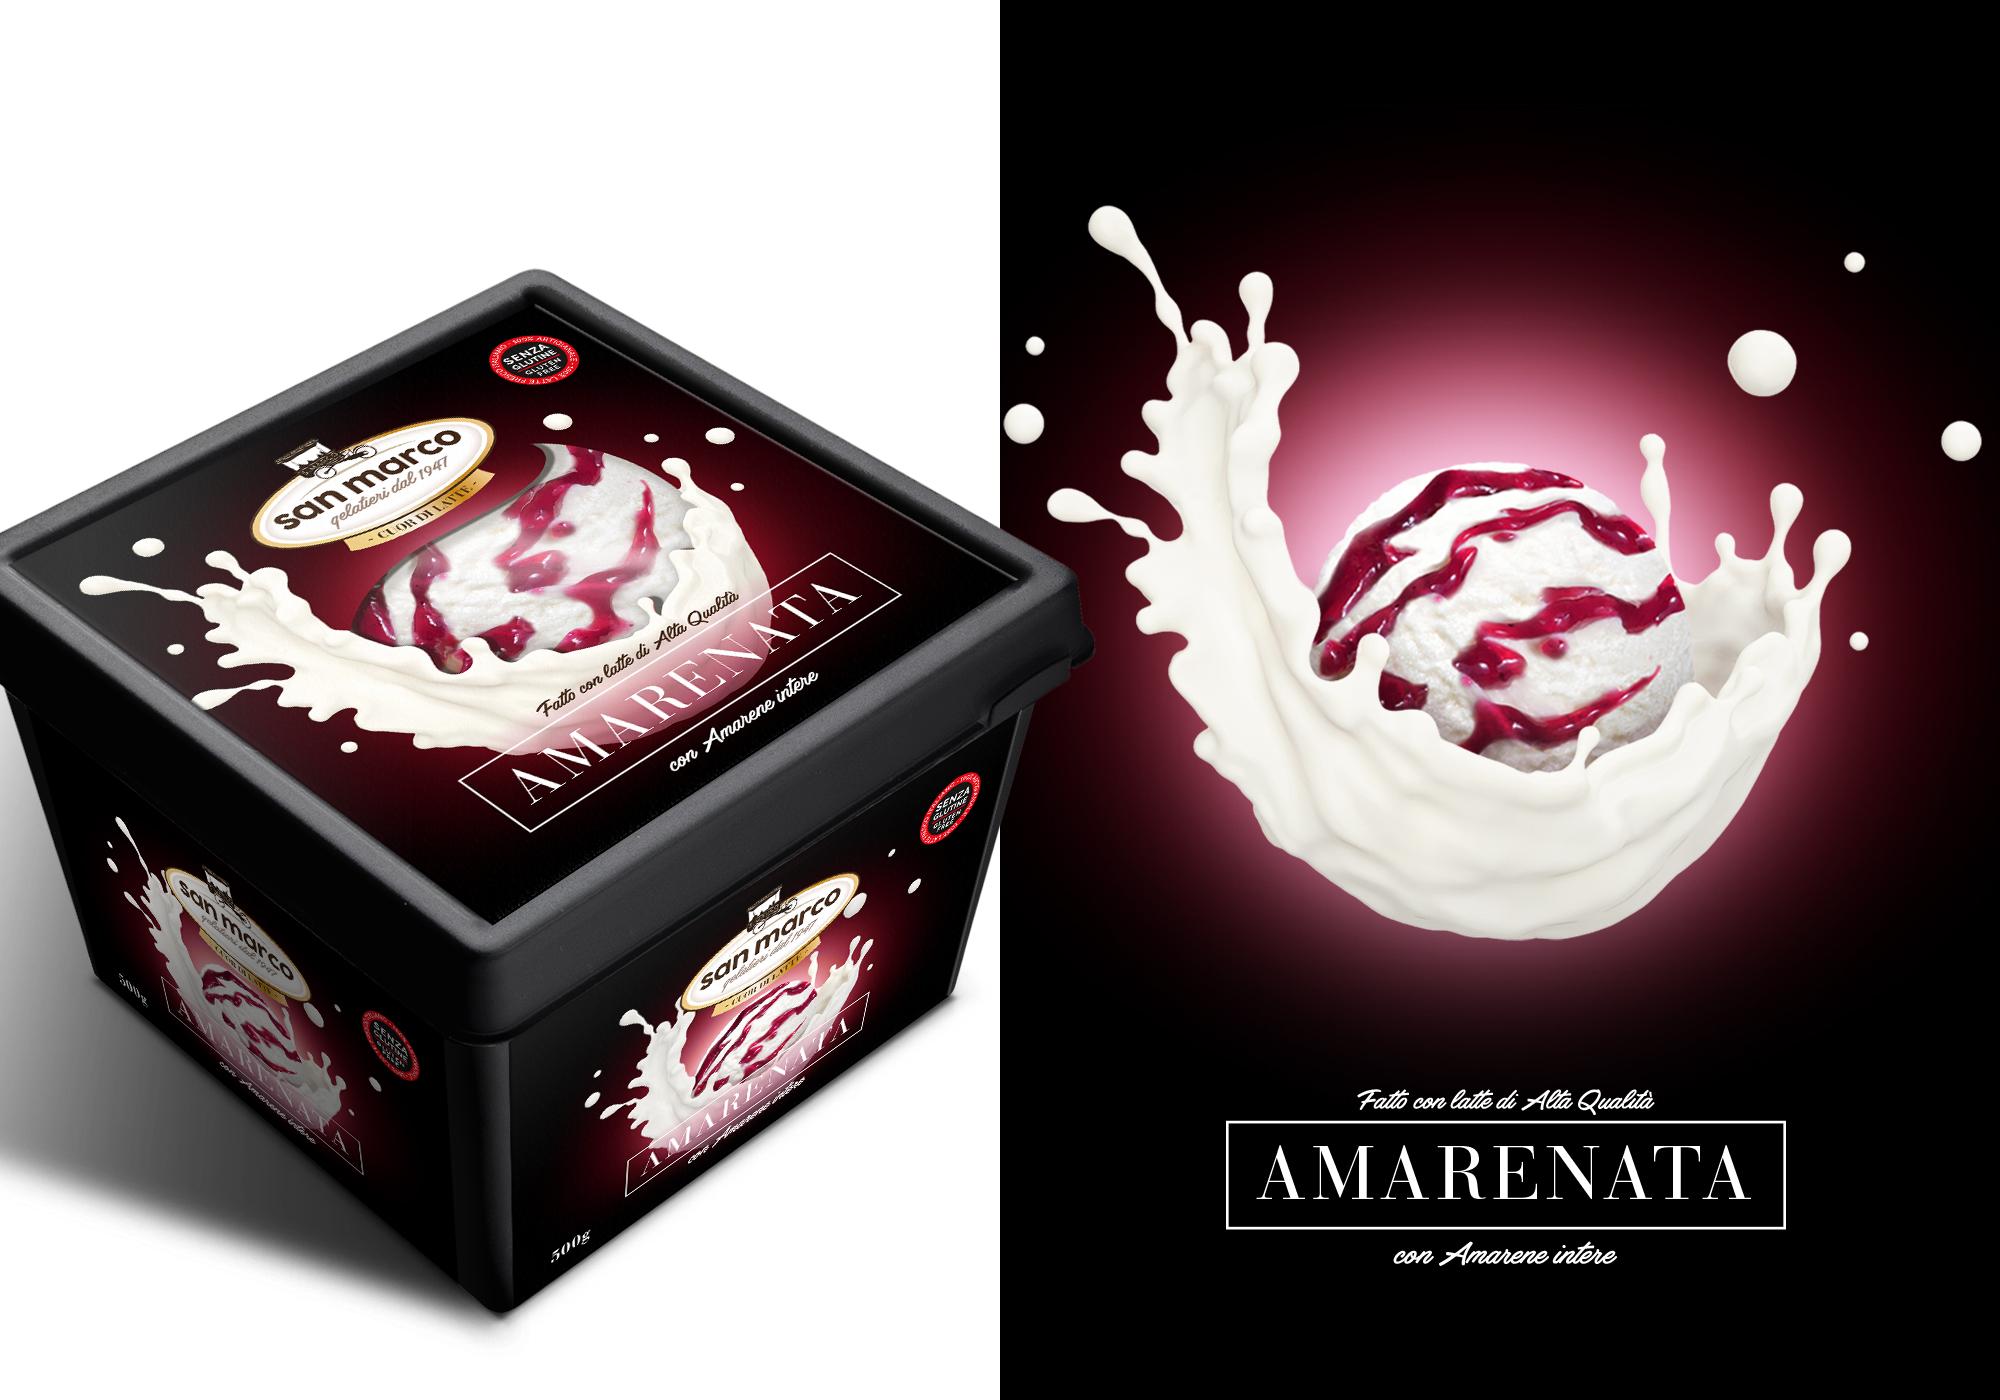 san marco cuor di latte – Amarena